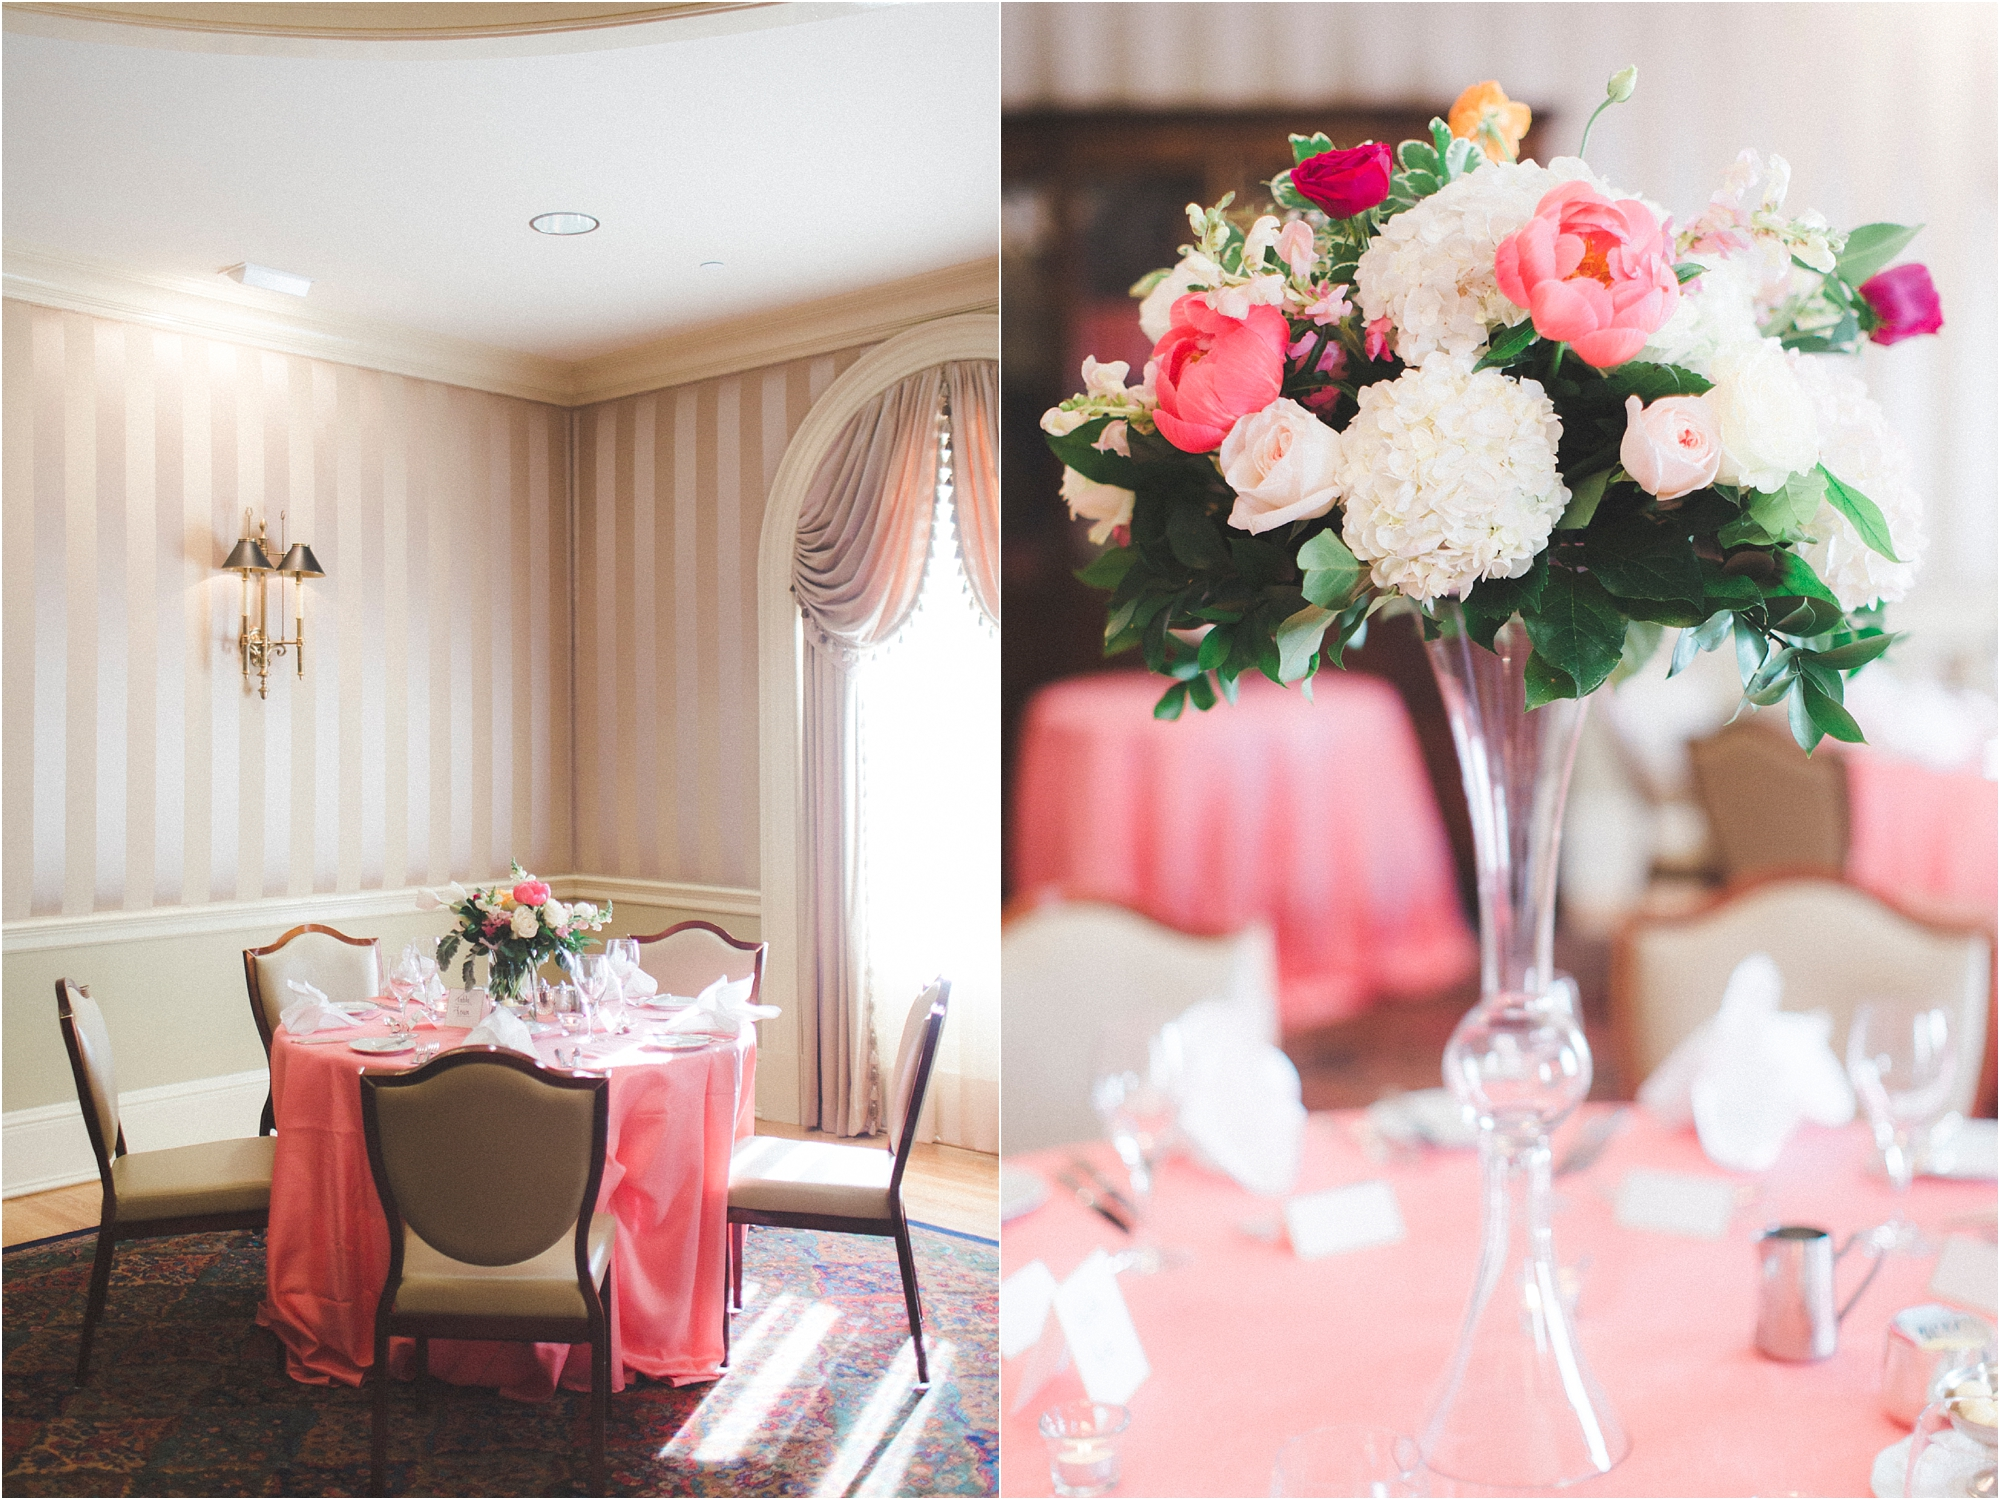 stephanie-yonce-photography-chic-historic-home-wedding-richmond-virginia-photos_0025.jpg